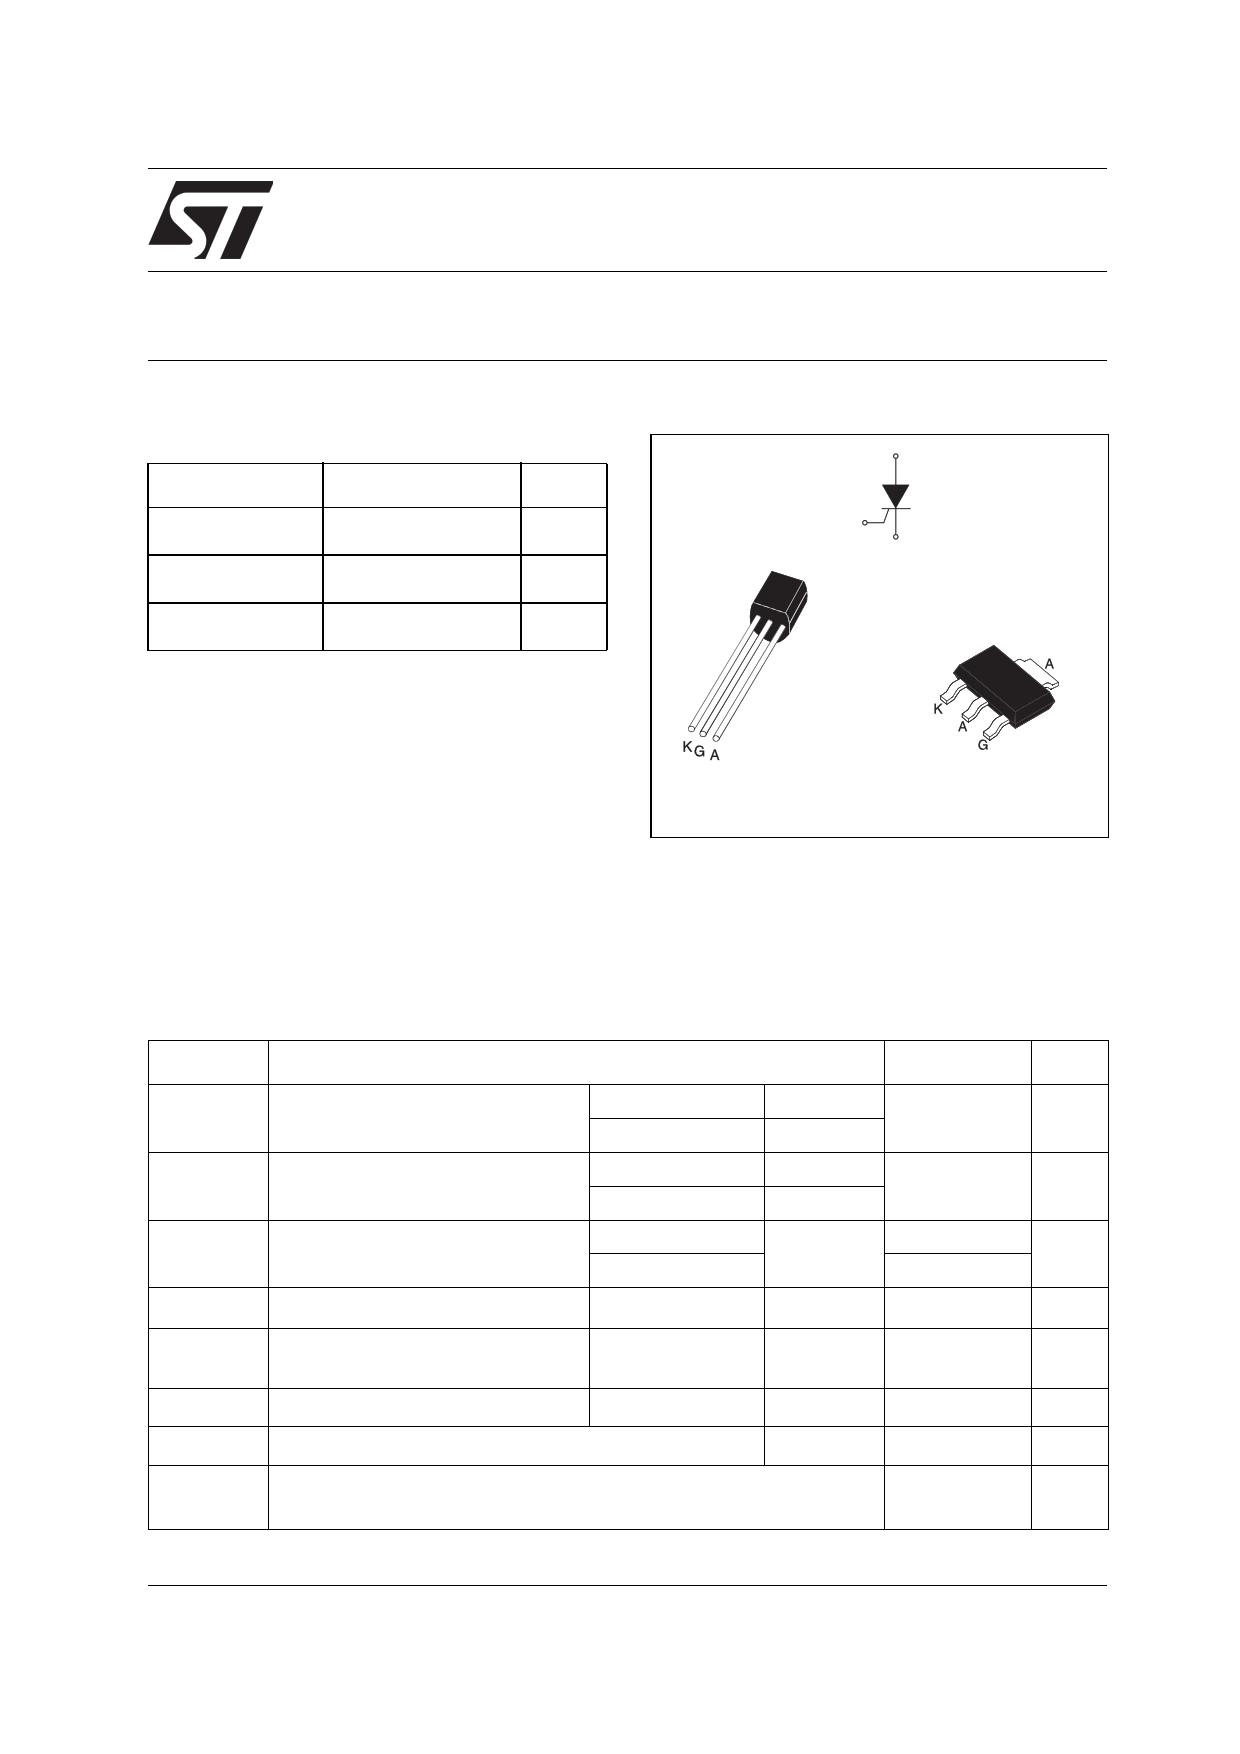 X0205MN datasheet